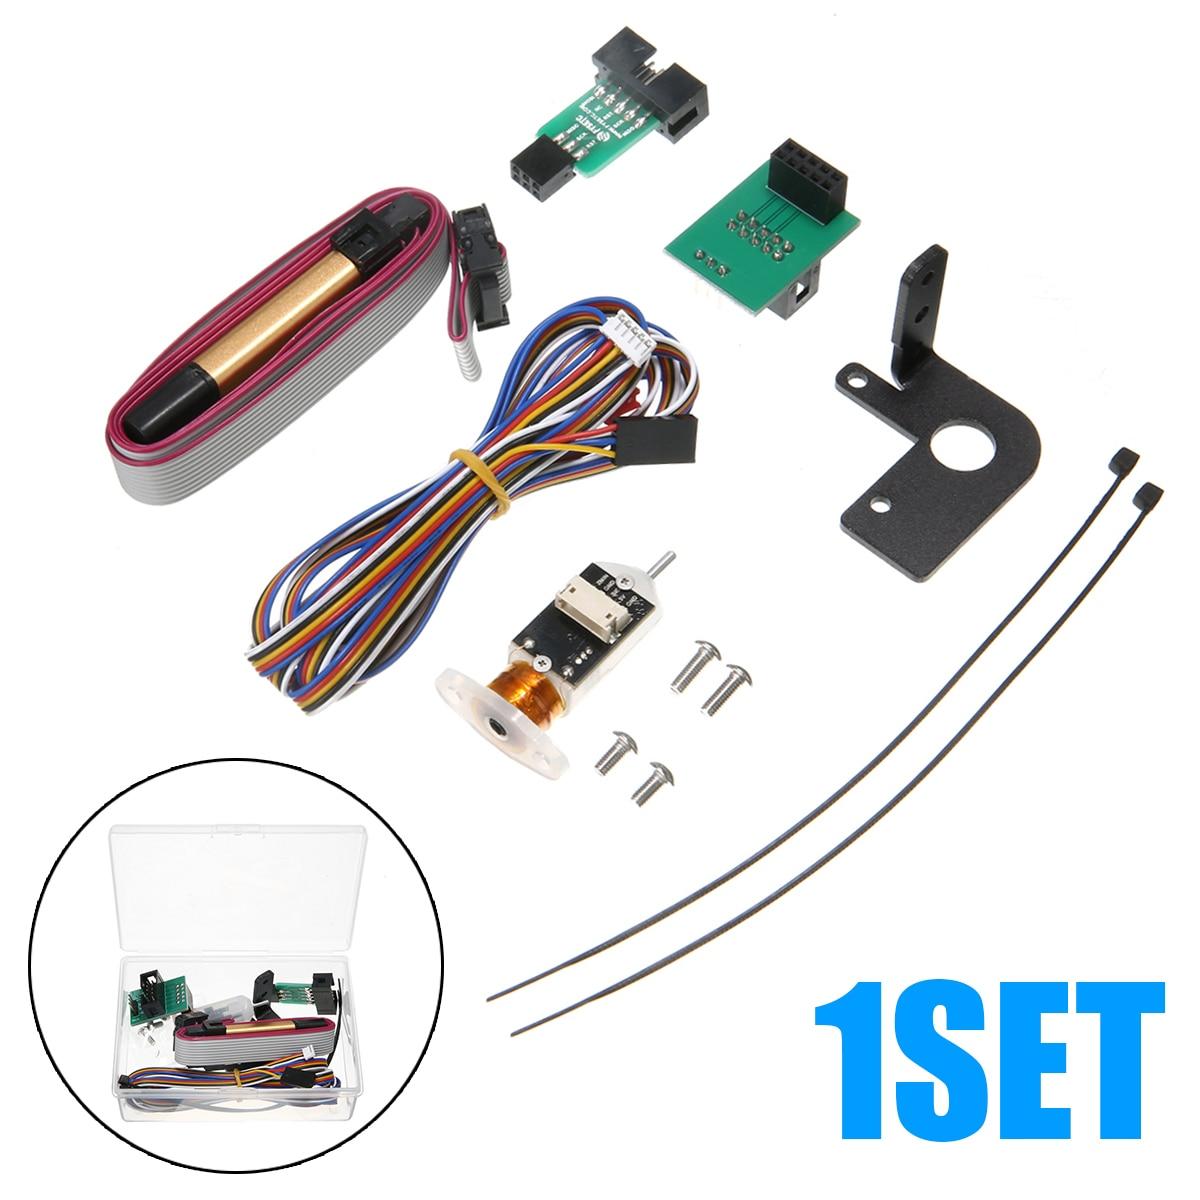 1 Juego de impresora 3D Sensor de nivelación táctil bl-touch Kit de Sensor de nivelación de cama automático para impresora 3D CR-10/ Ender-3